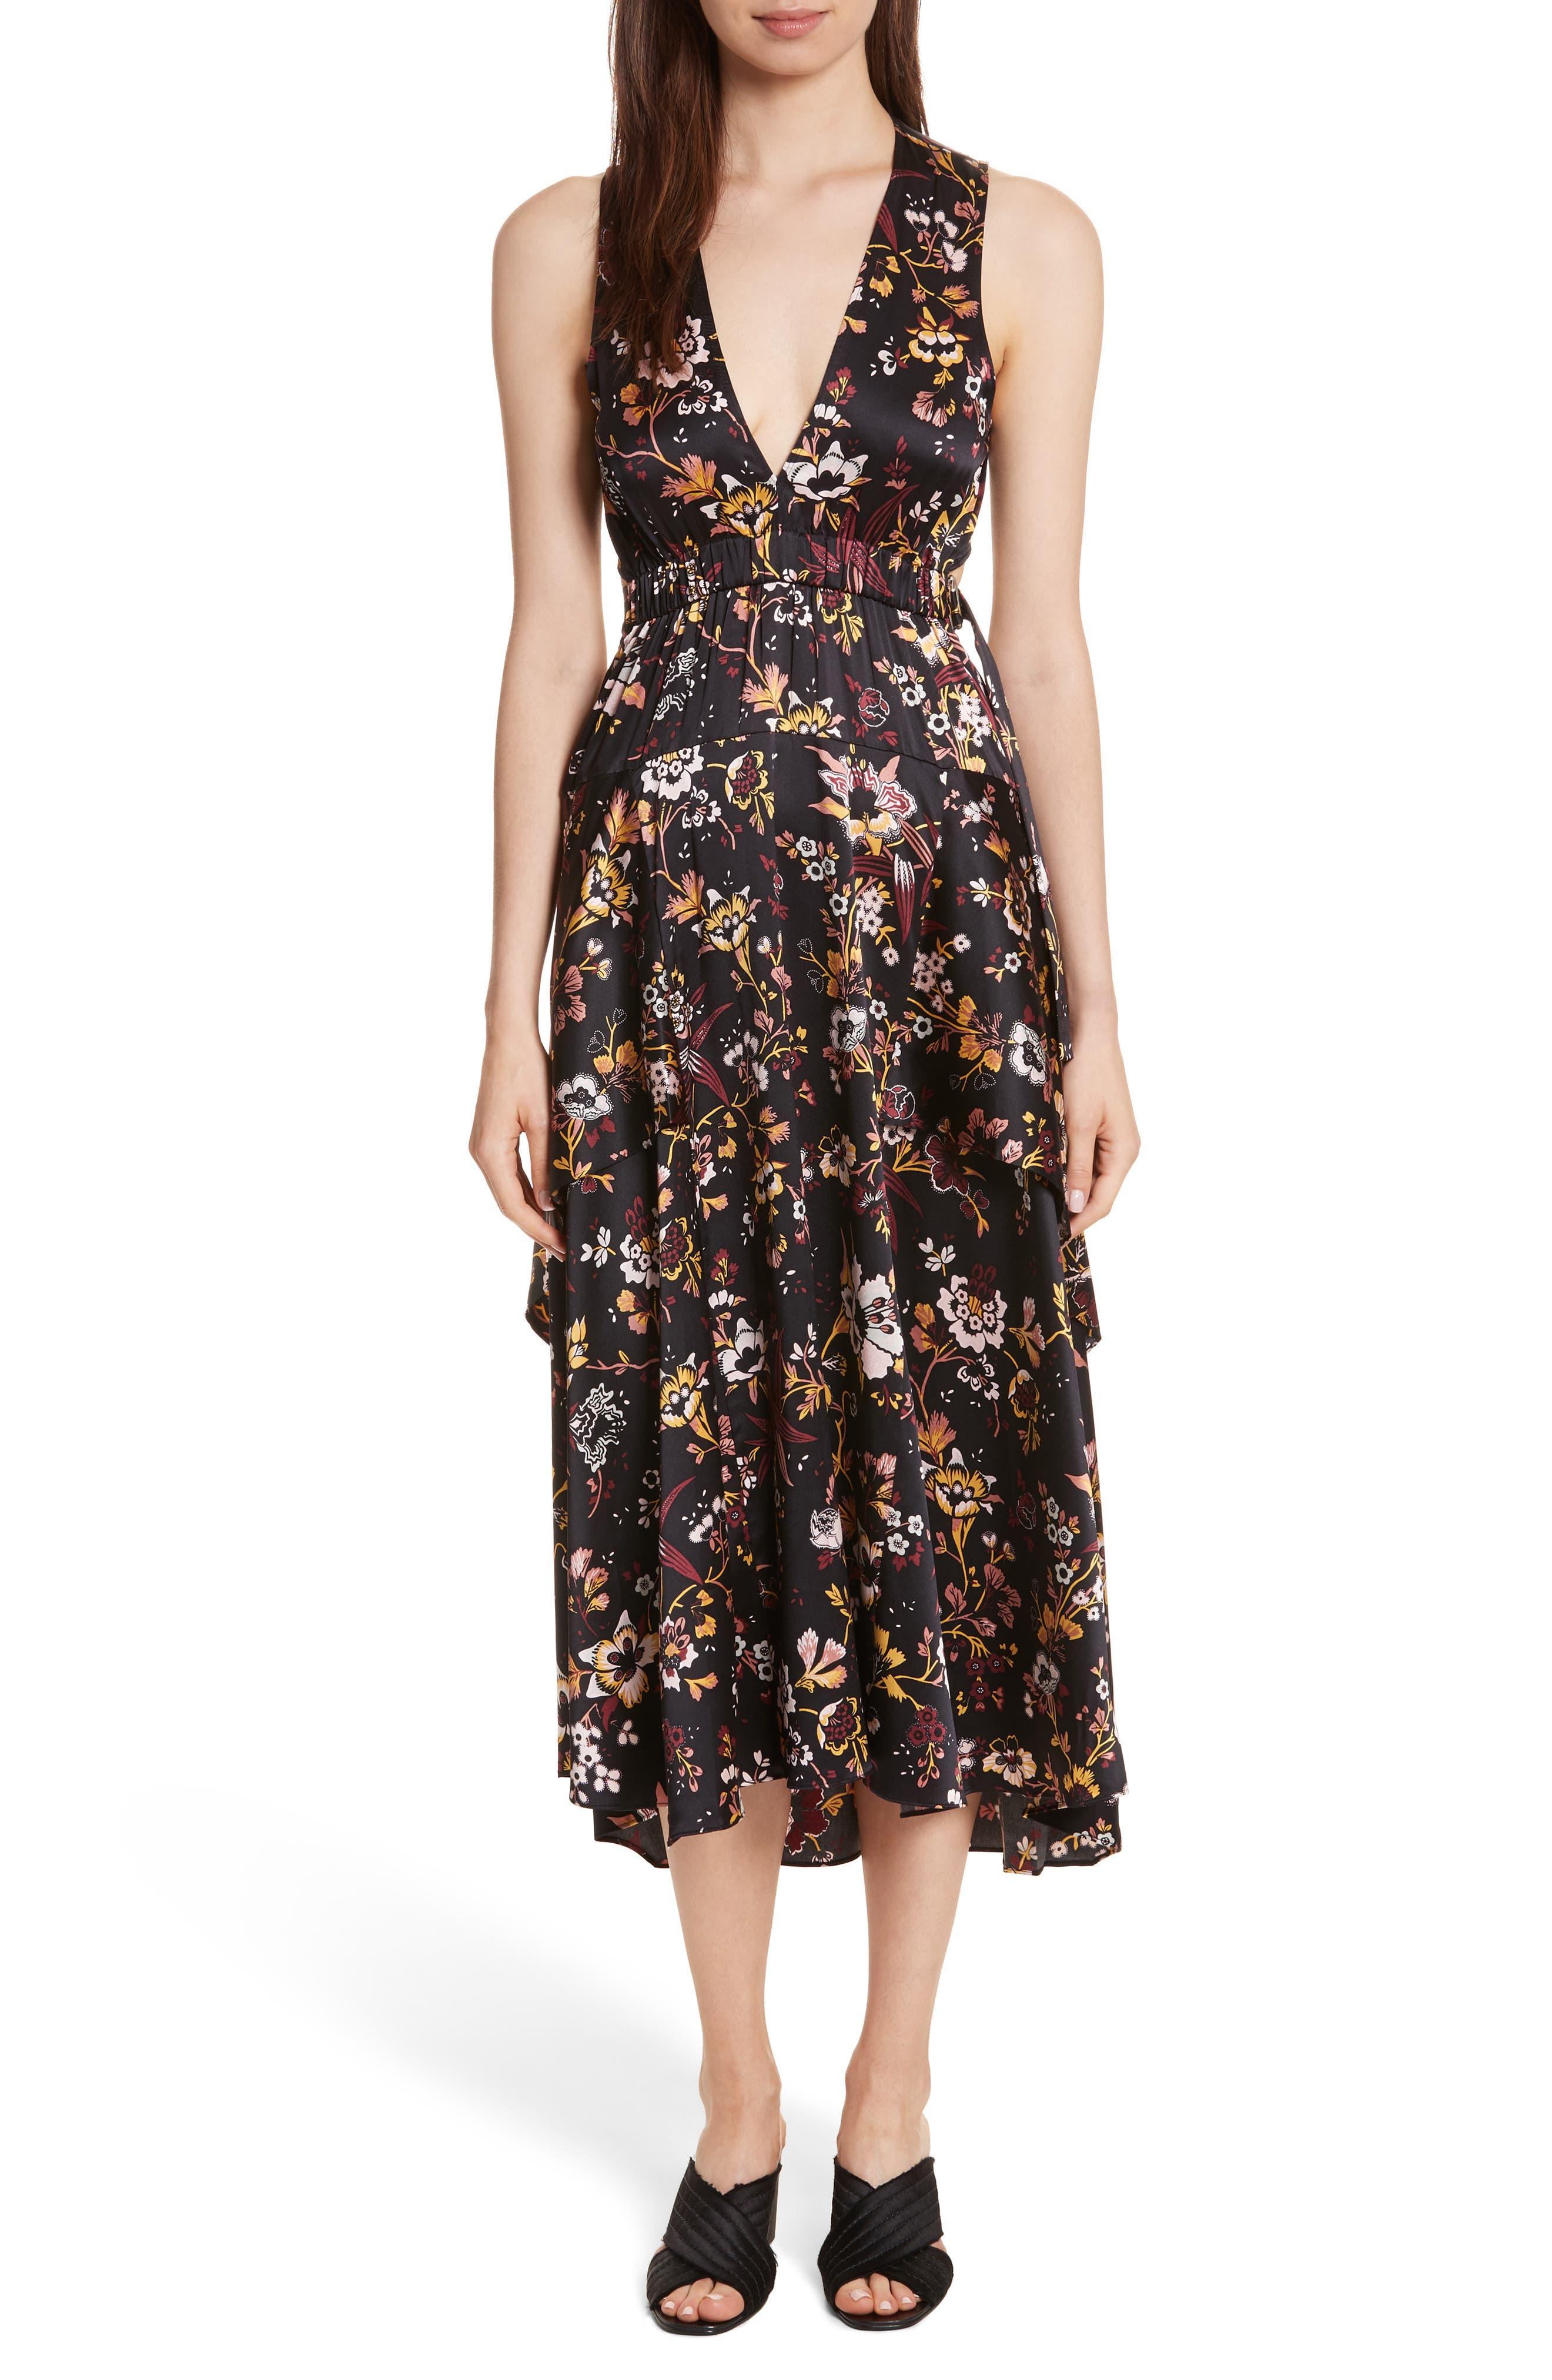 Verbena Floral Print Stretch Silk Dress,                             Main thumbnail 1, color,                             002